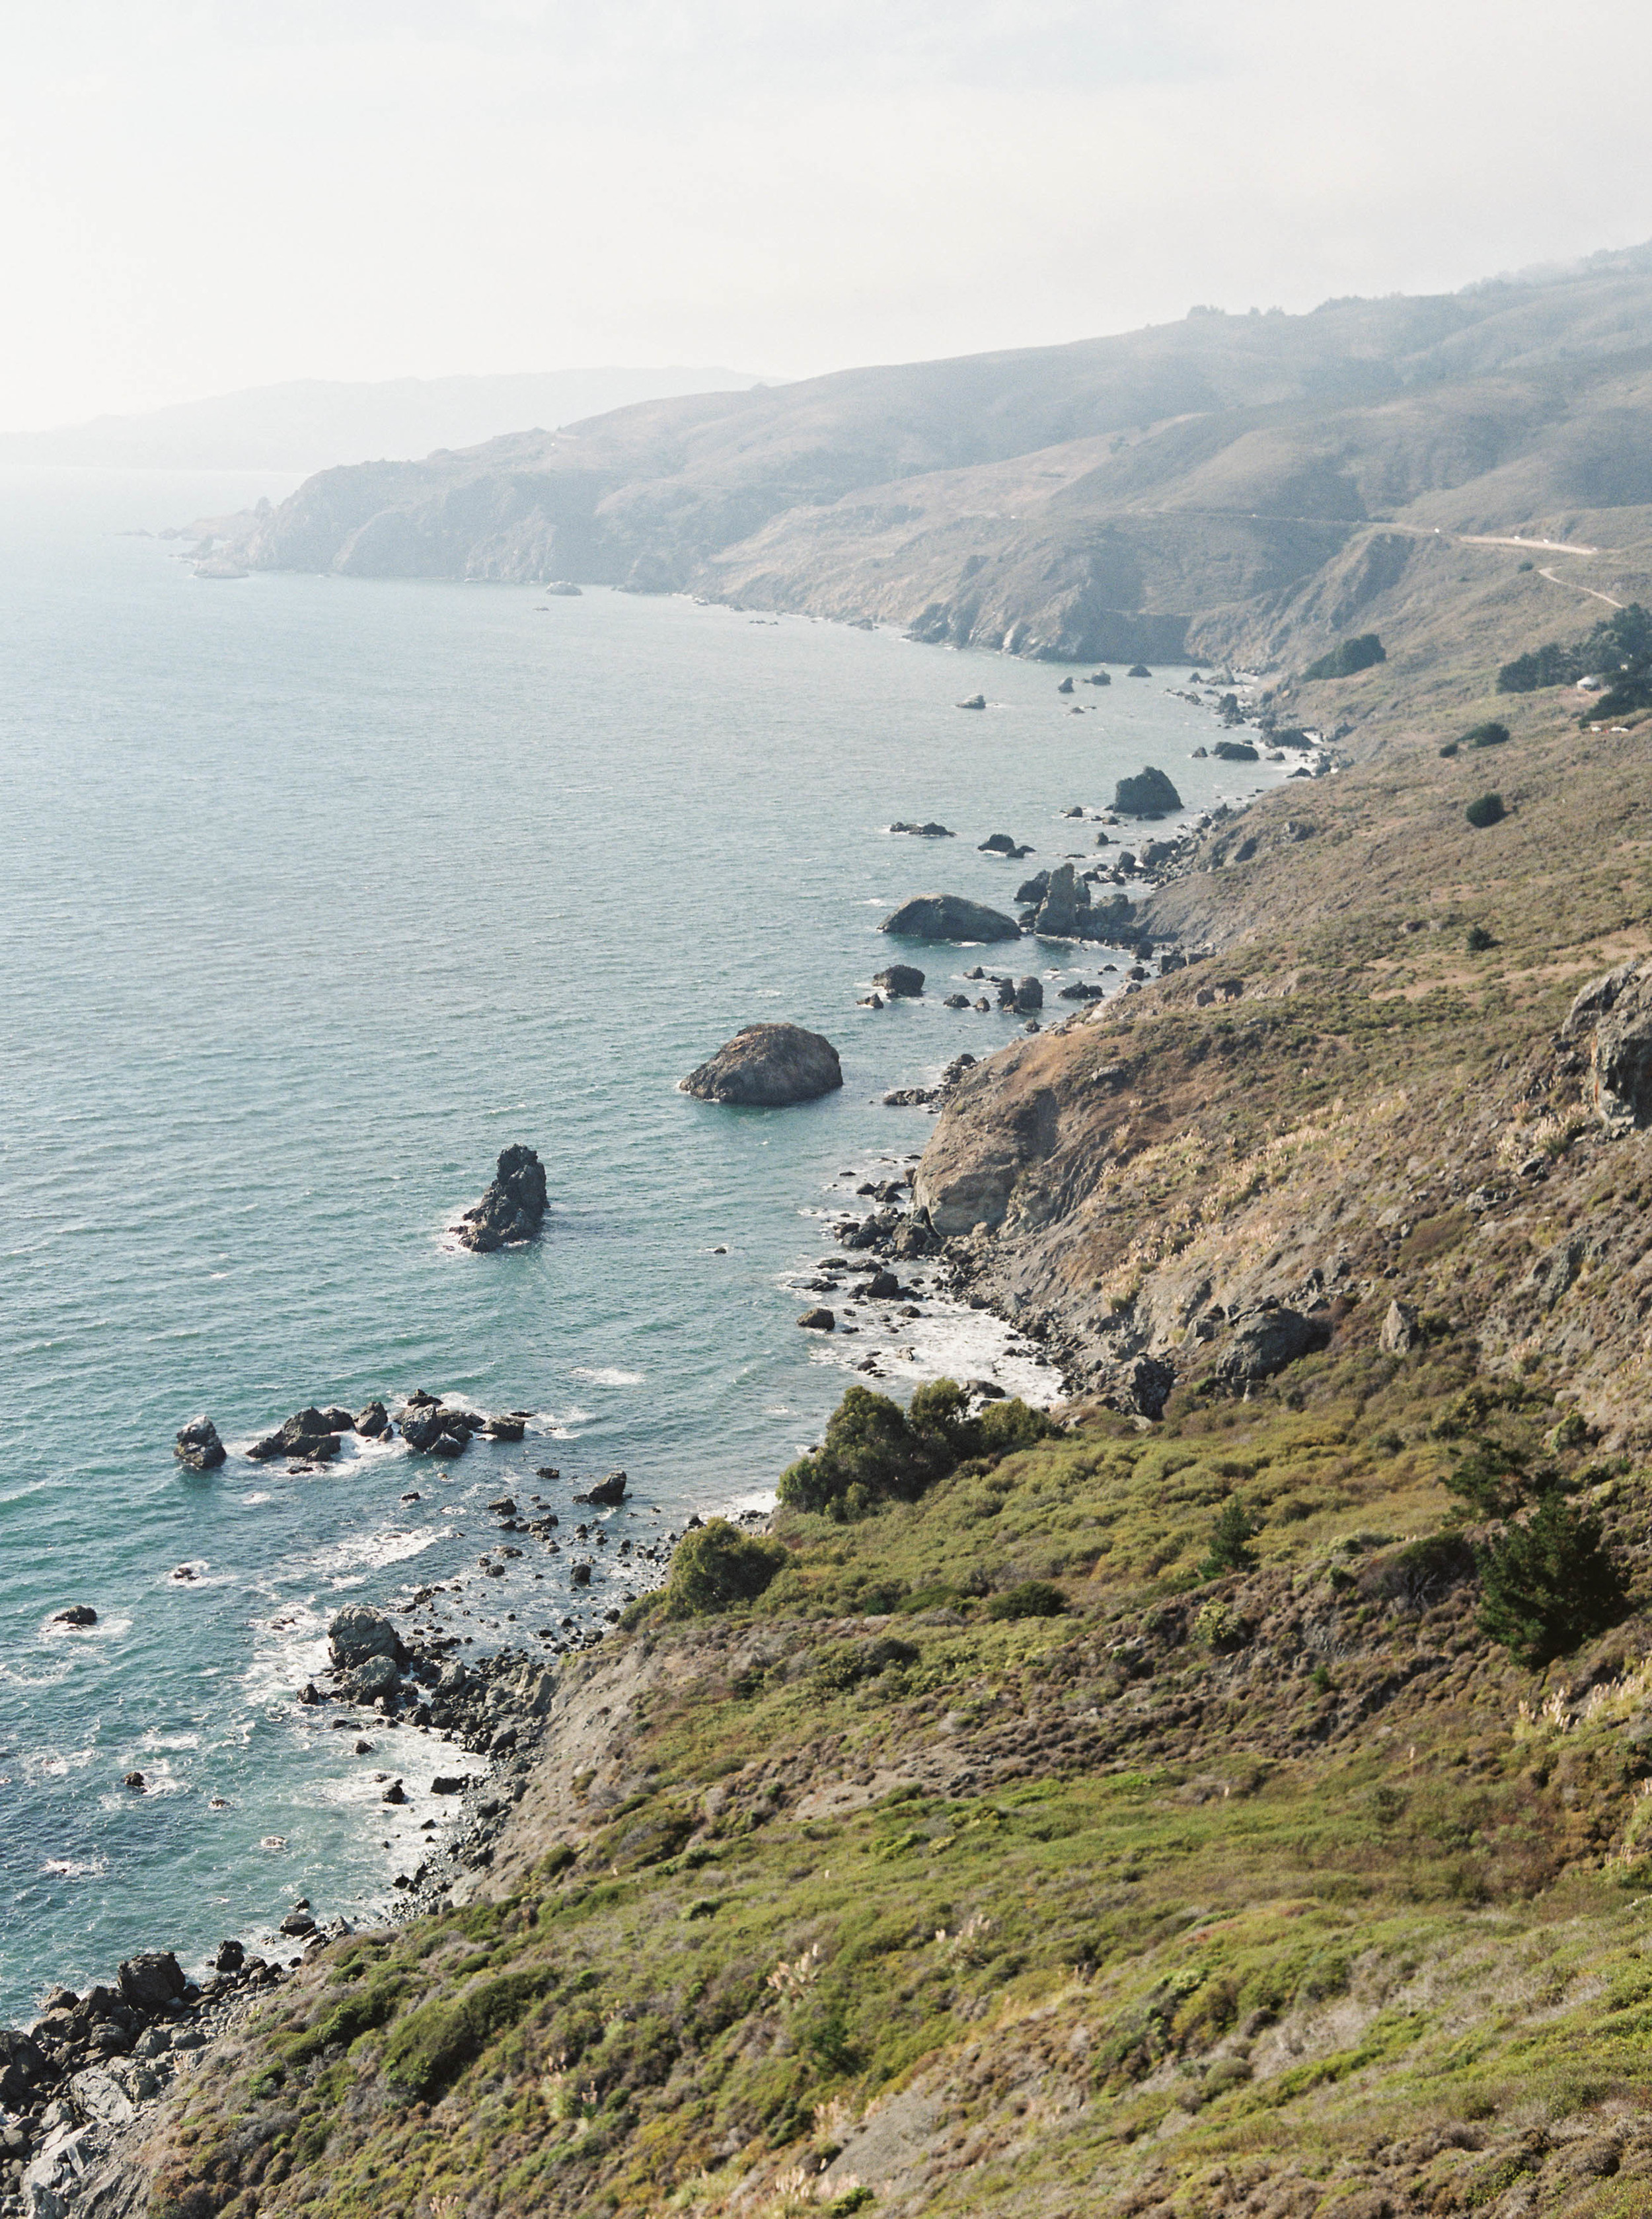 Meghan Mehan Photography - Fine Art Film Wedding Photography - San Francisco | Napa | Sonoma | Big Sur | Santa Barbara - 009.jpg